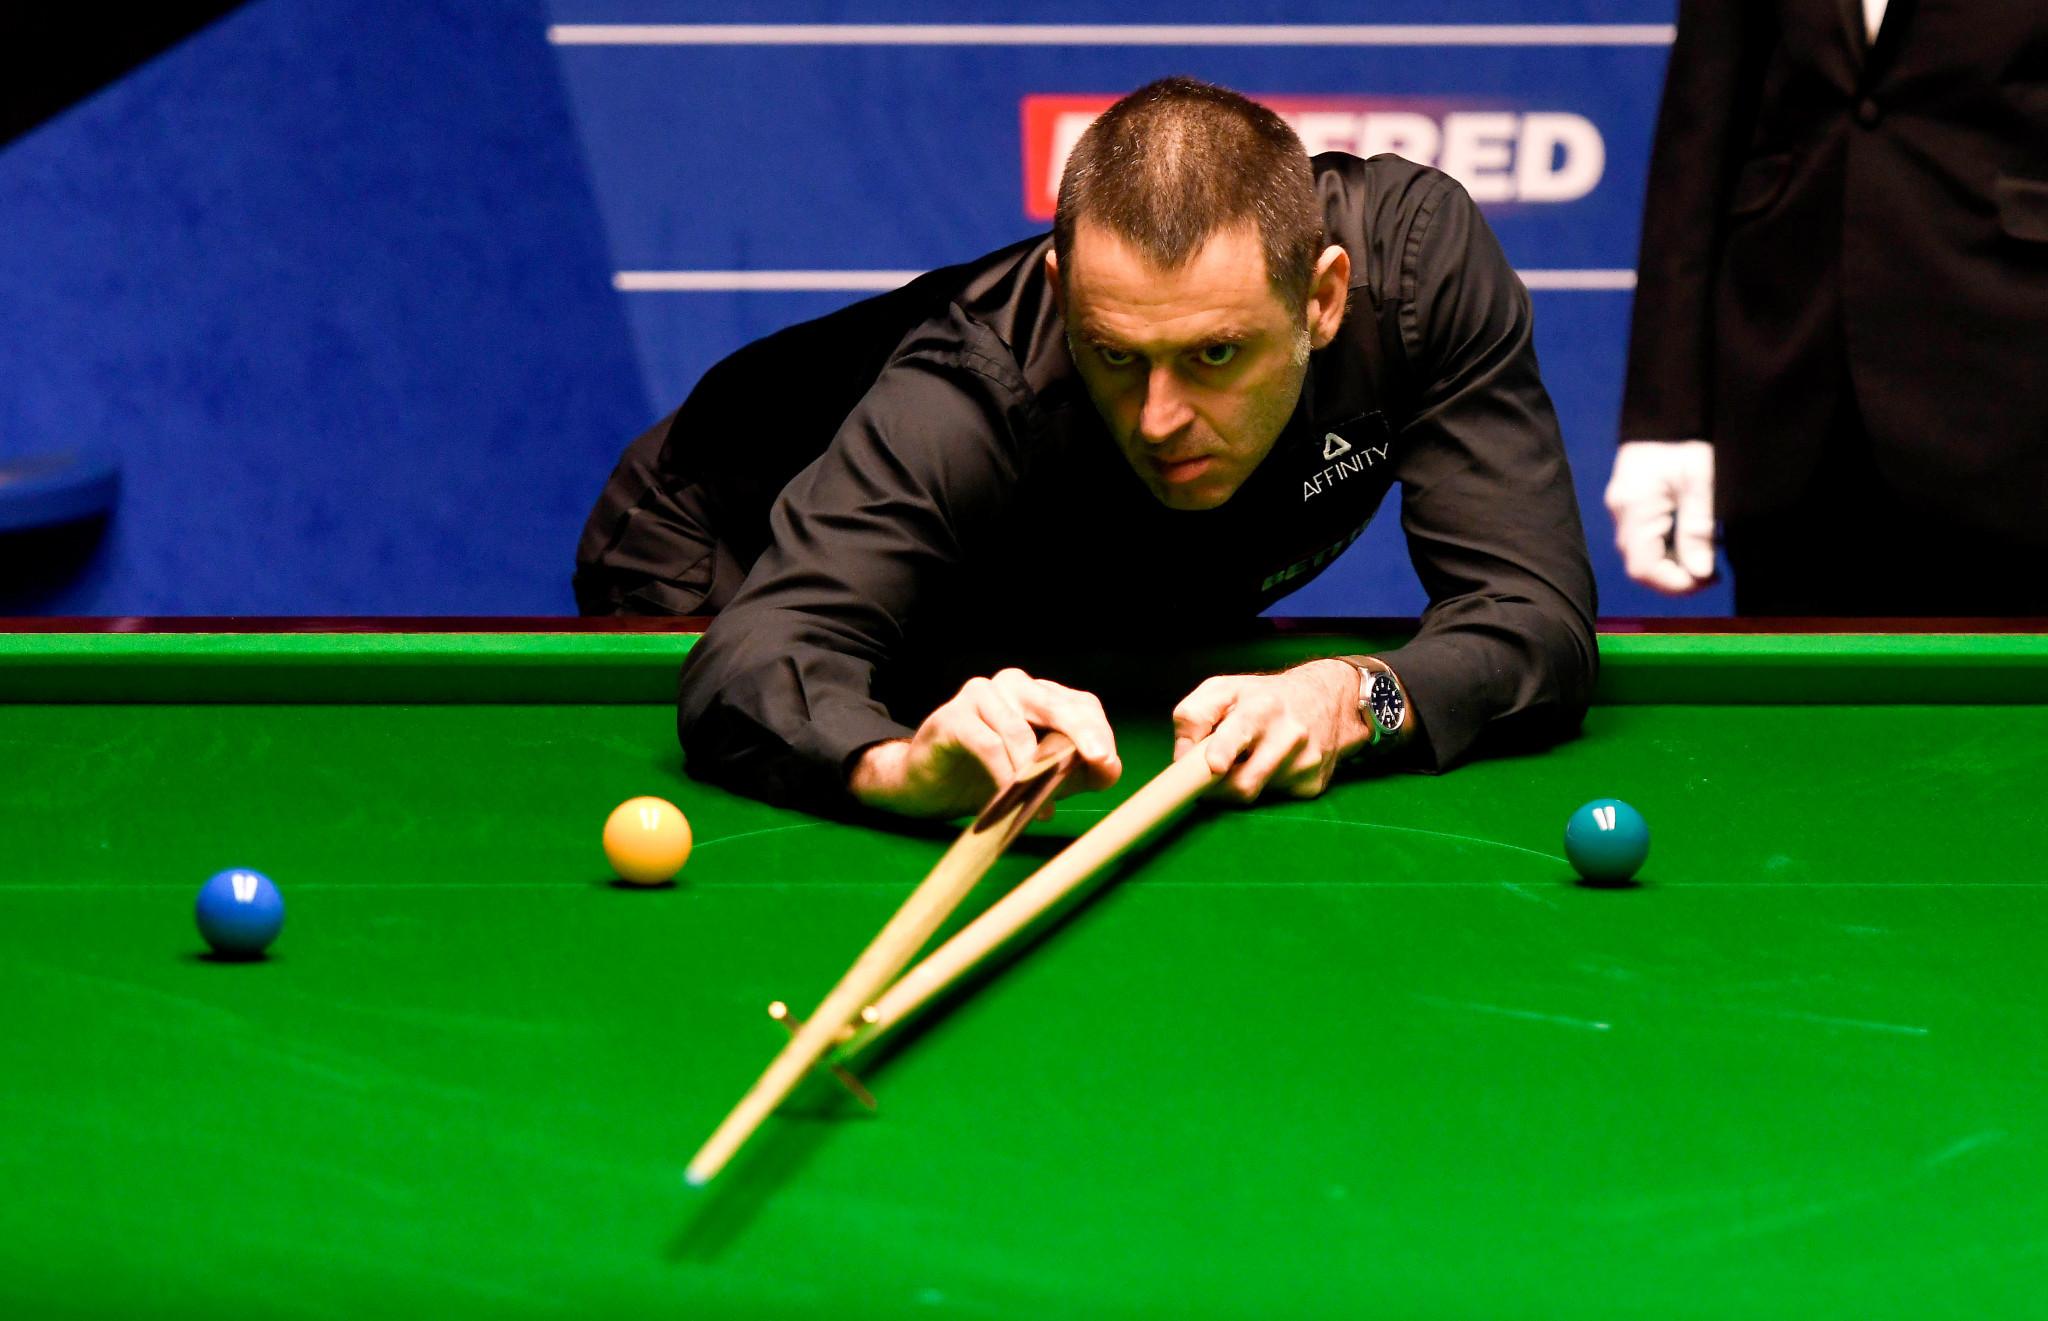 O'Sullivan wins World Snooker Championship for sixth time